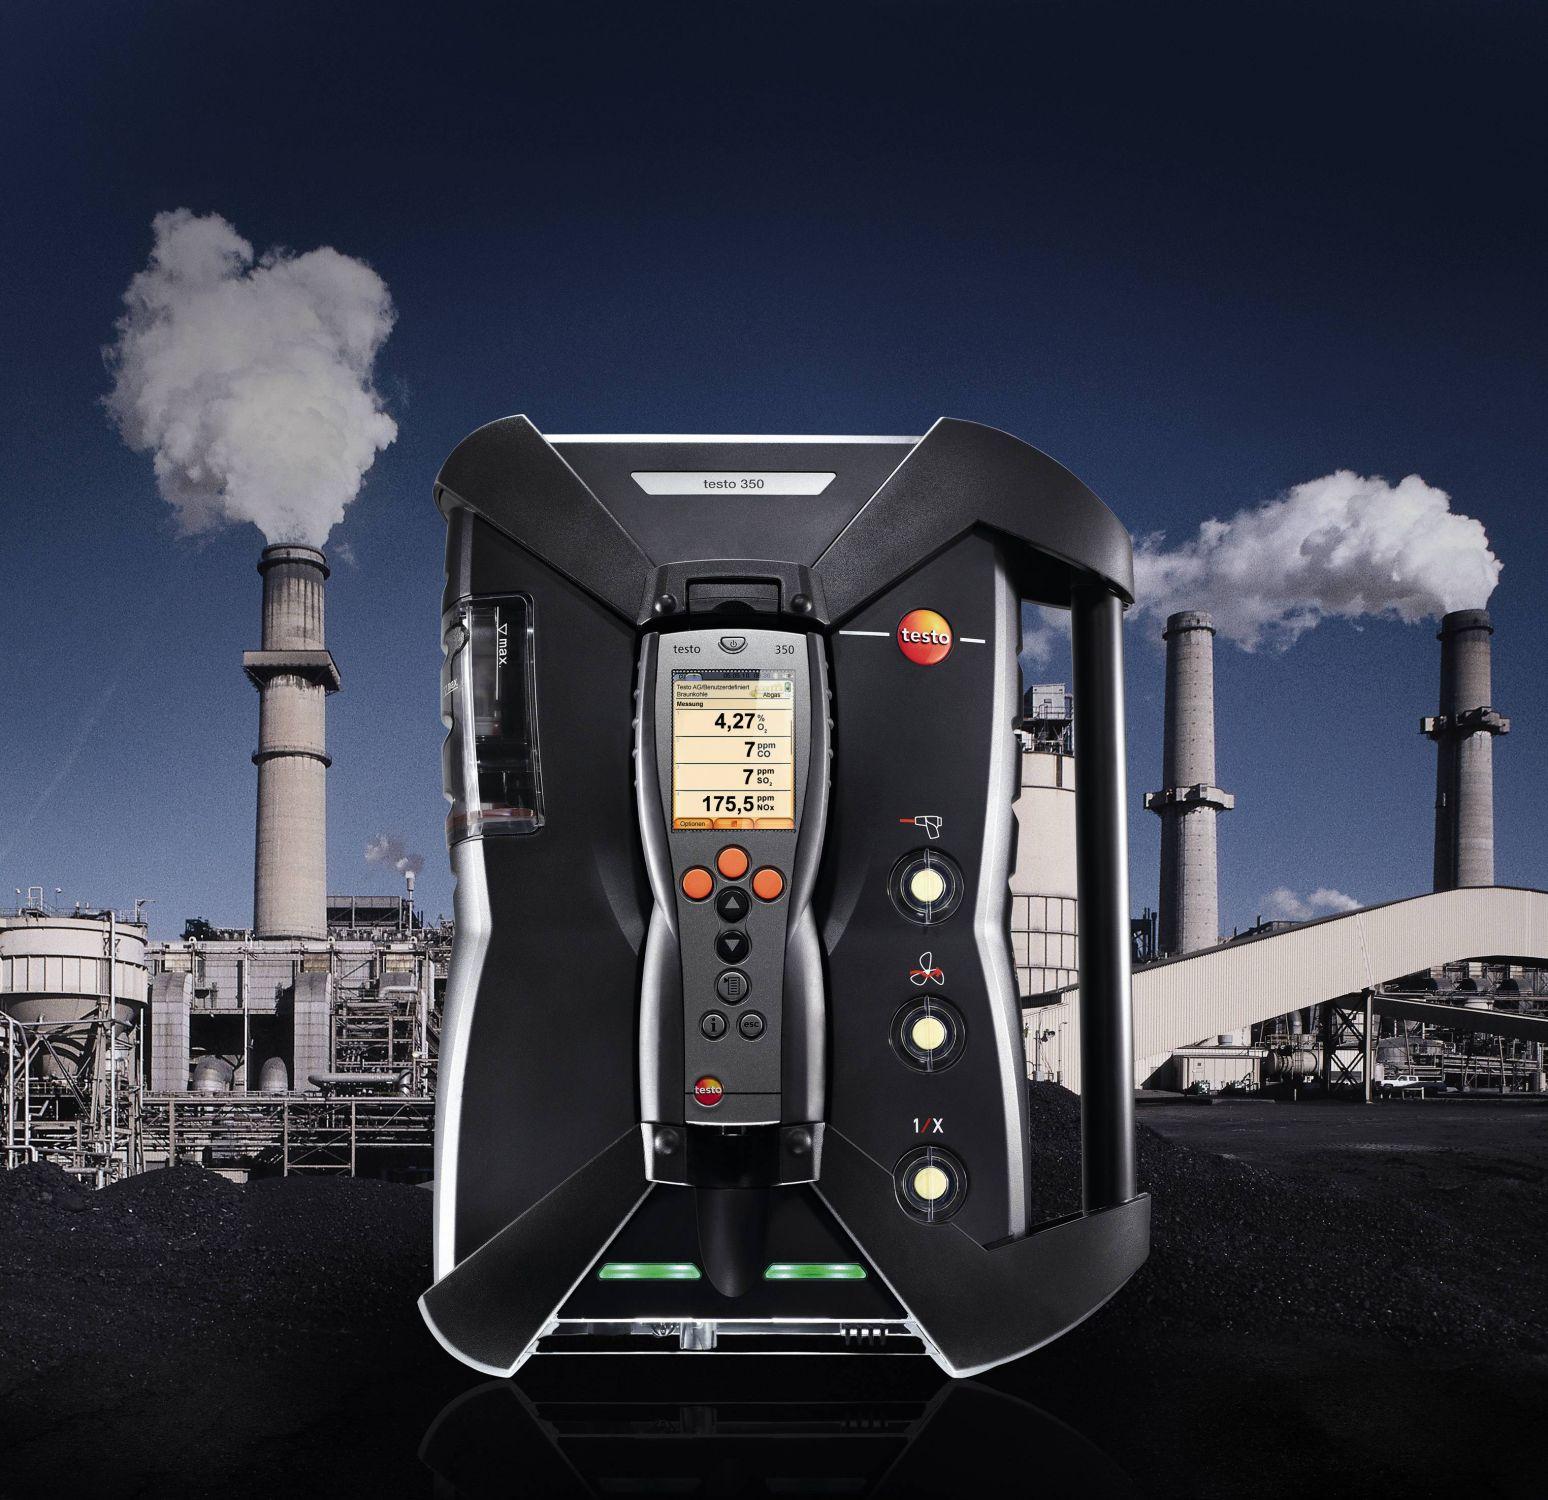 testo 350 combustion analyser